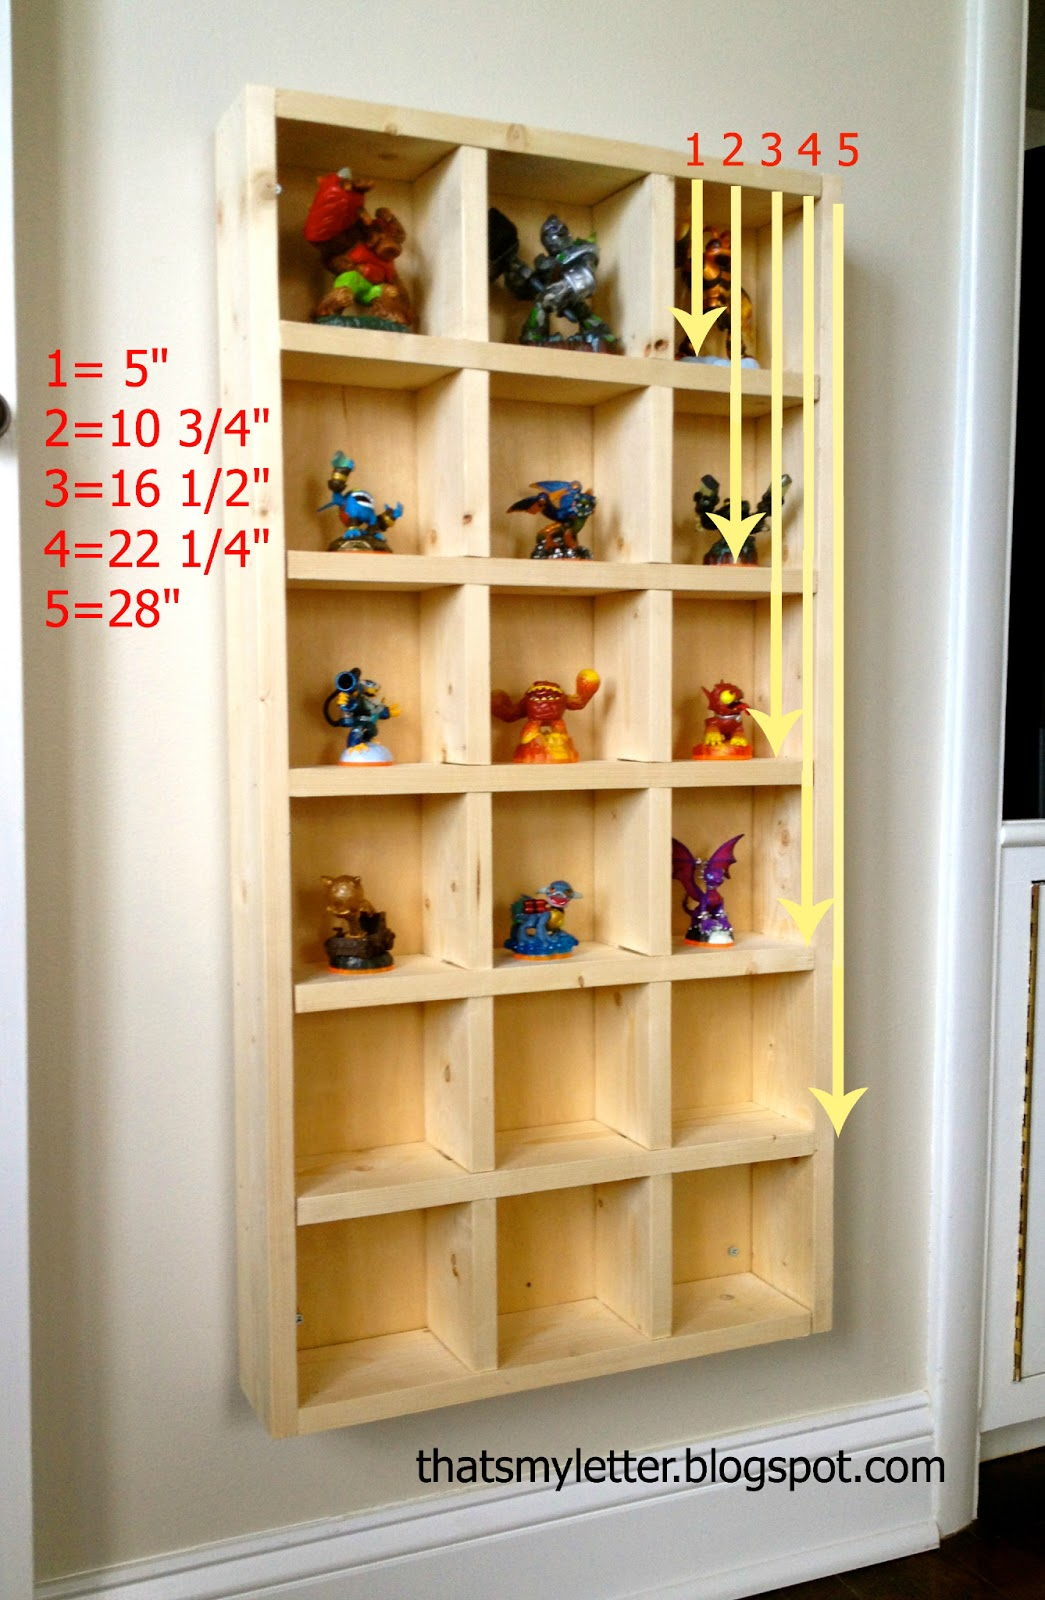 DIY Skylanders Storage Shelf - Jaime Costiglio